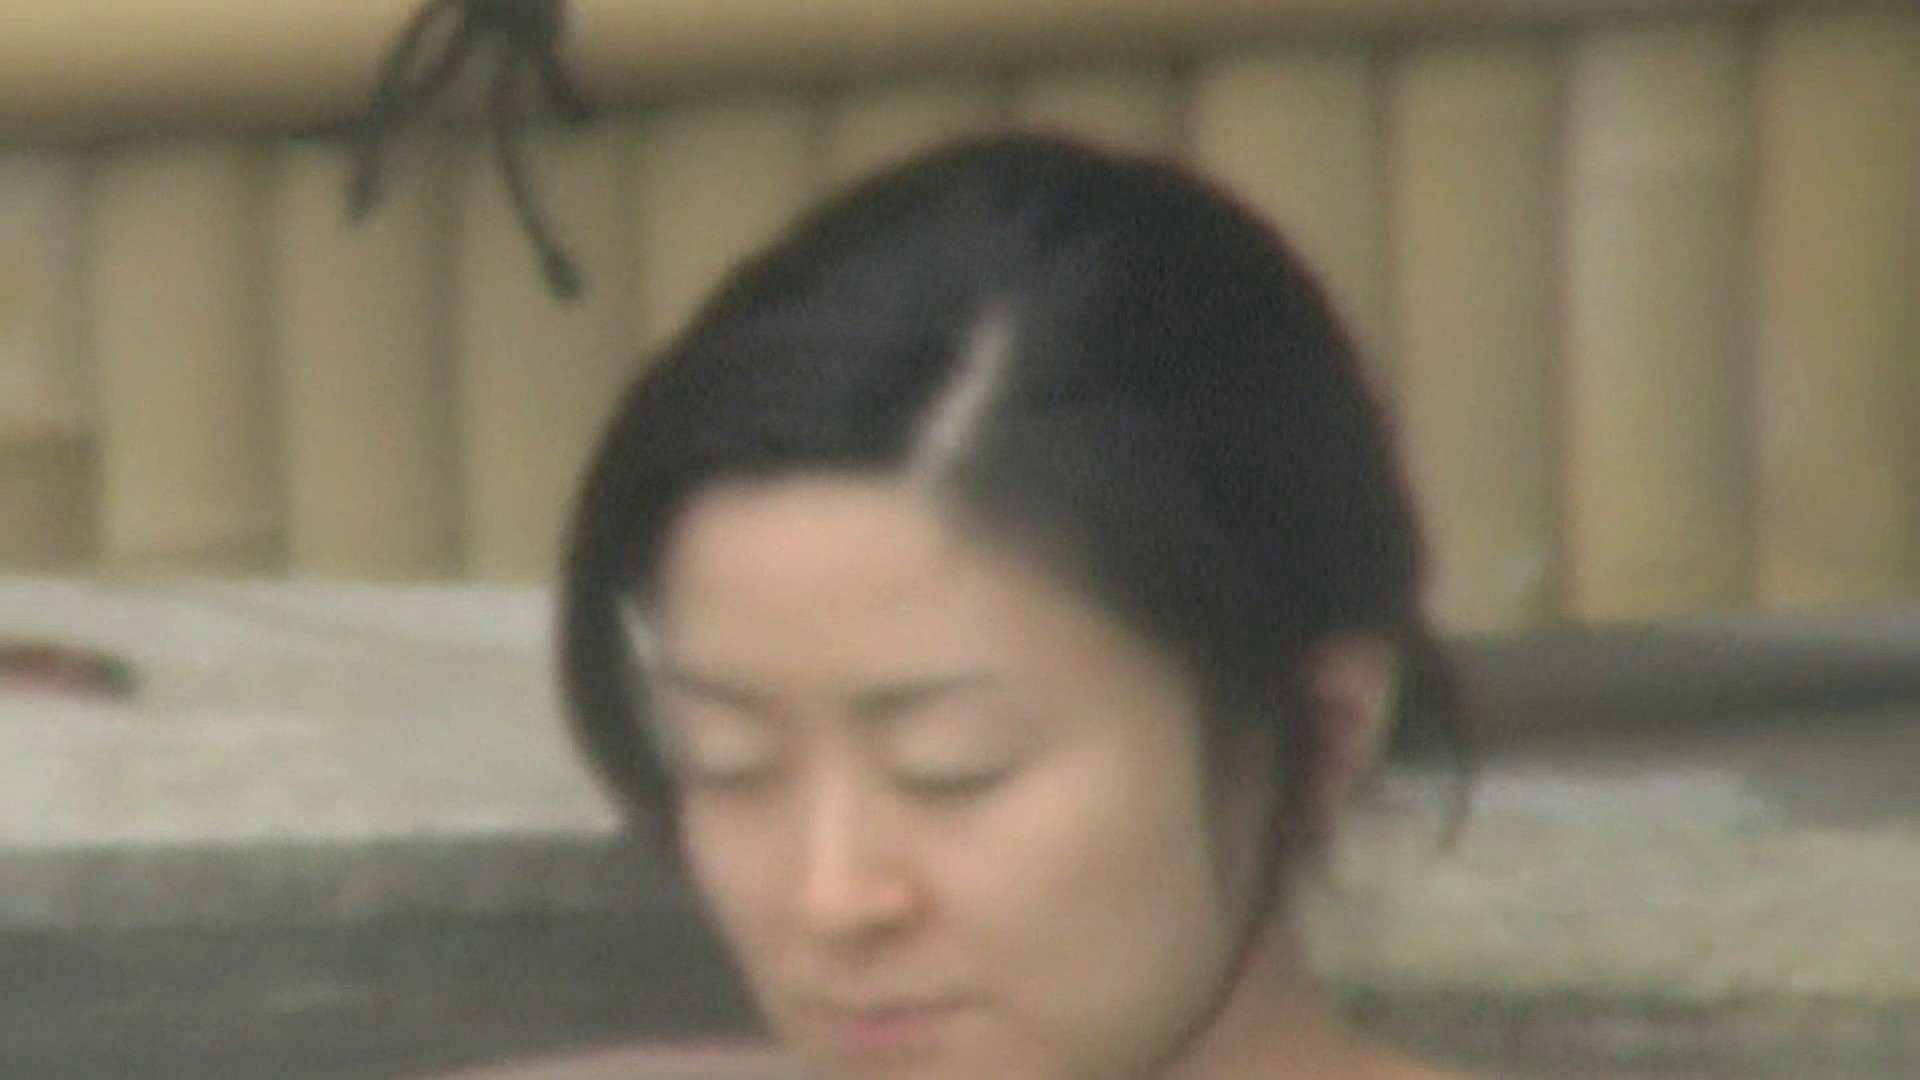 Aquaな露天風呂Vol.548 OLセックス のぞきエロ無料画像 103画像 47